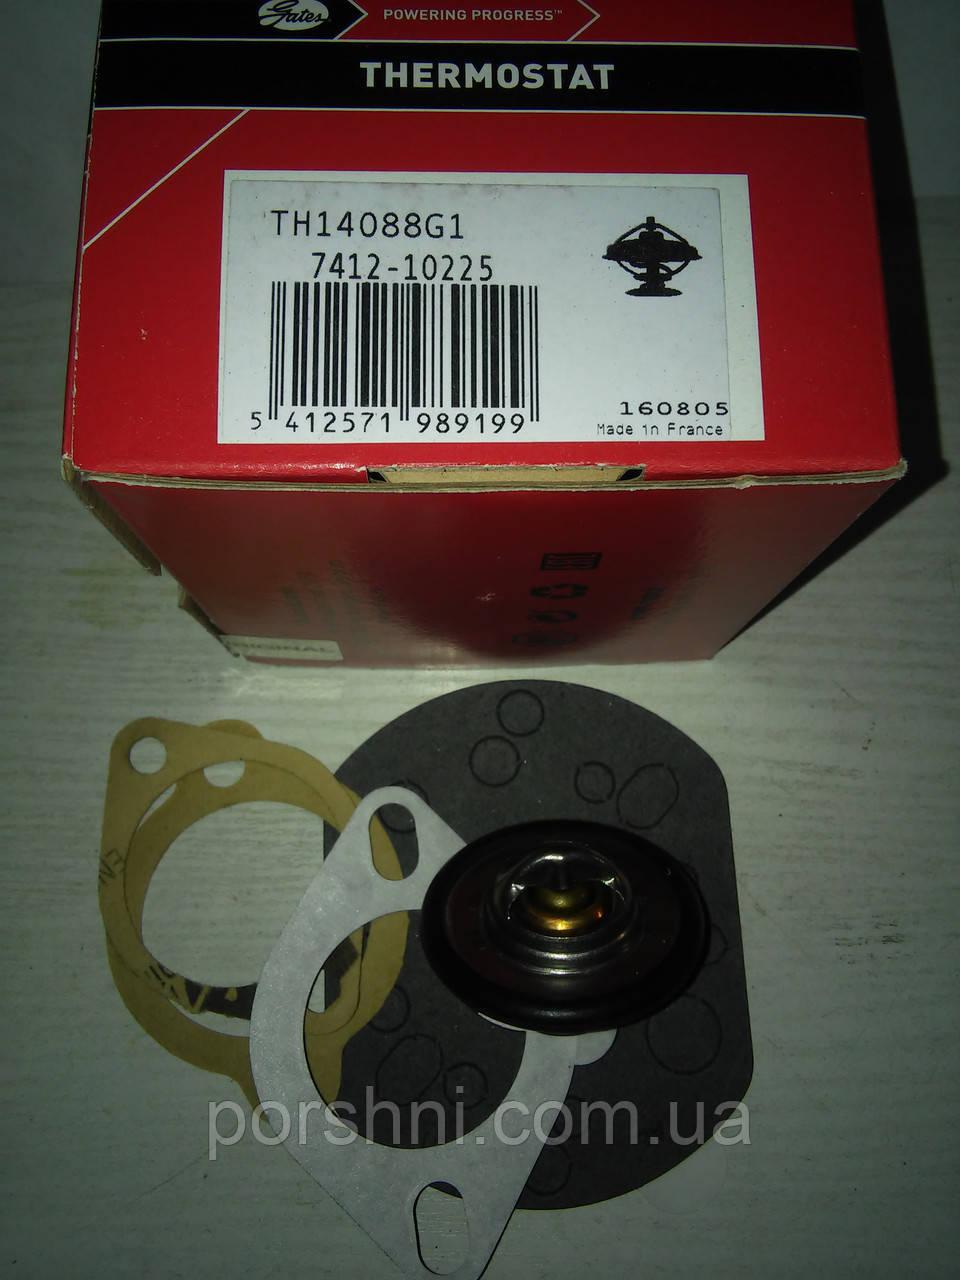 Термостат Ford Scorpio Sierra ДОНС GATES TH14088G1